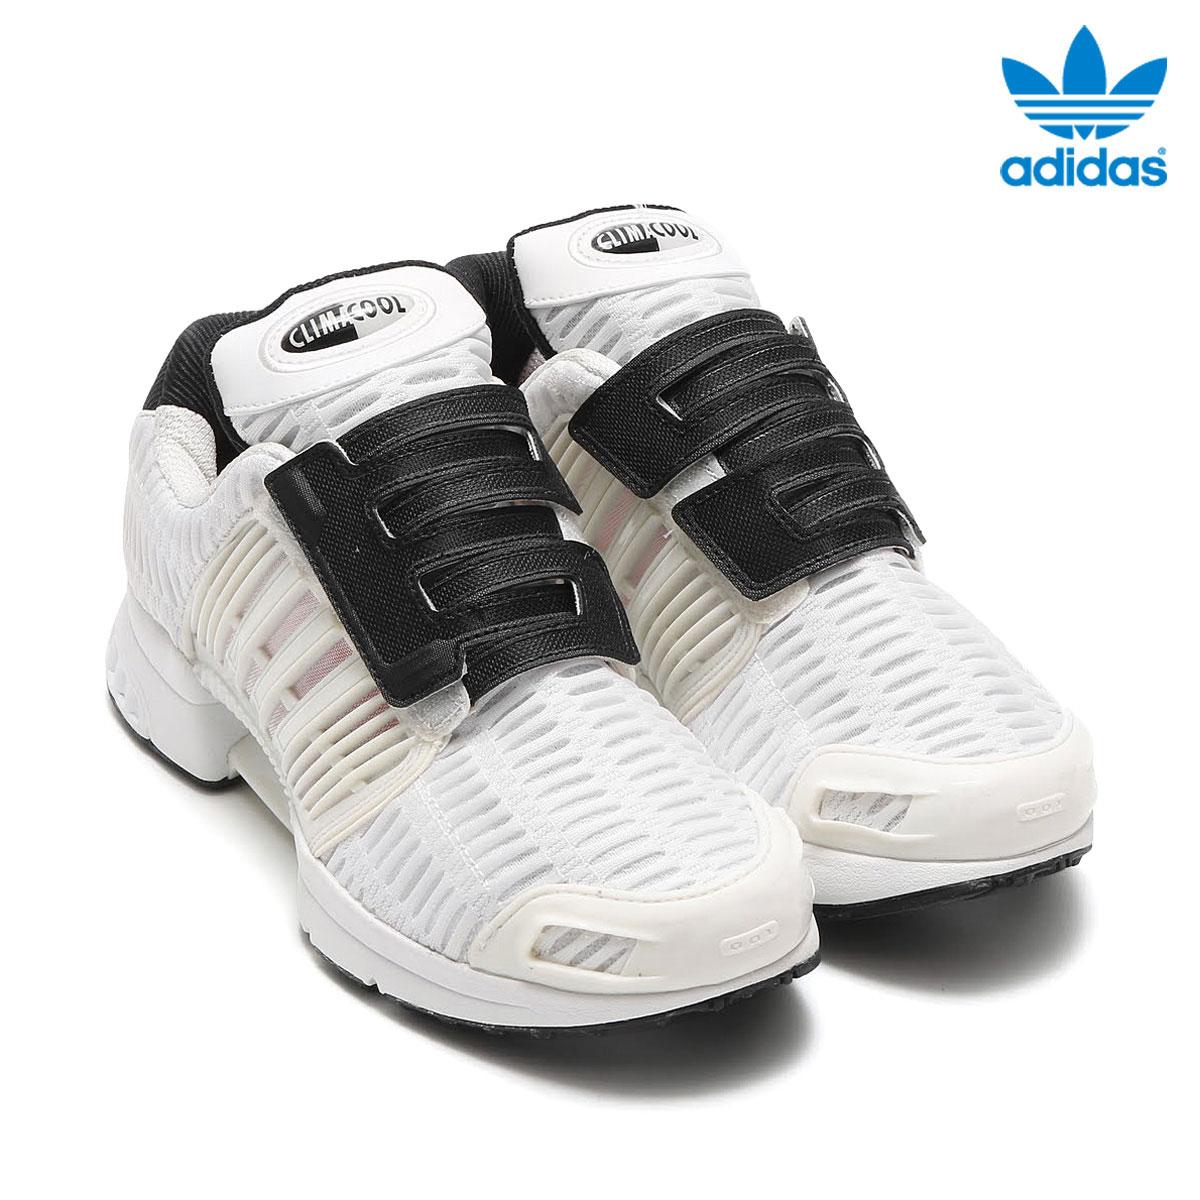 sale retailer c3361 7bdc0 ... where to buy adidas originals climacool 1 cmf 1 cmf vintage white  vintage white core black